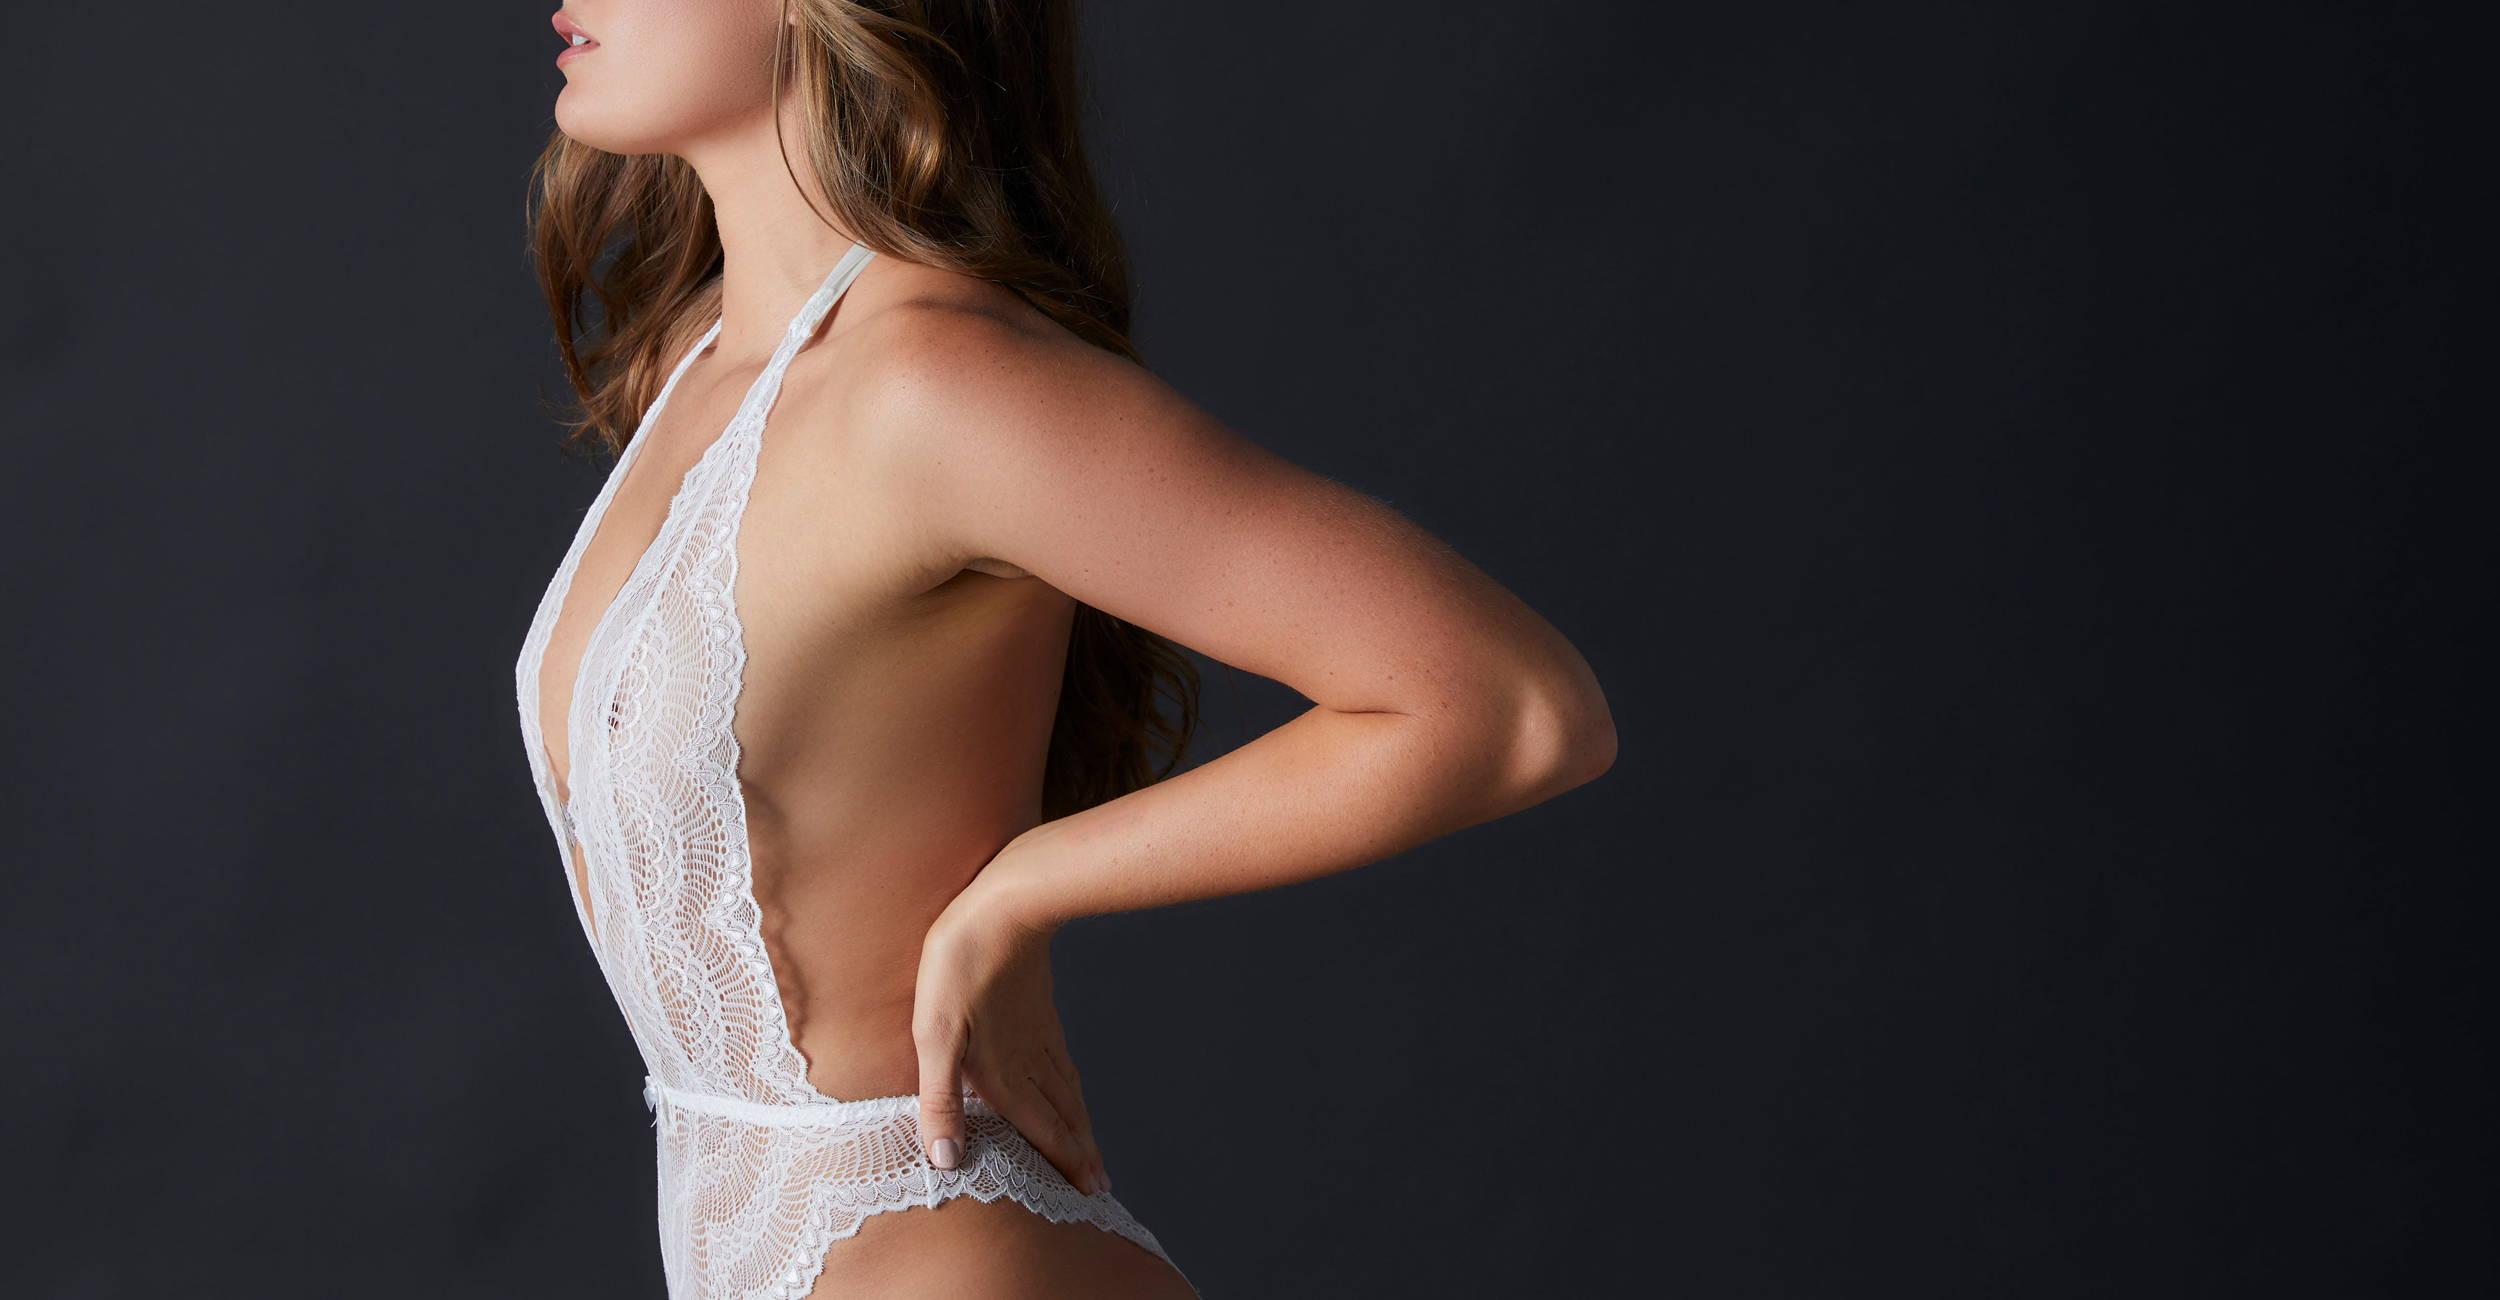 Woman wearing the Journelle Natalia Bodysuit in Alabaster White